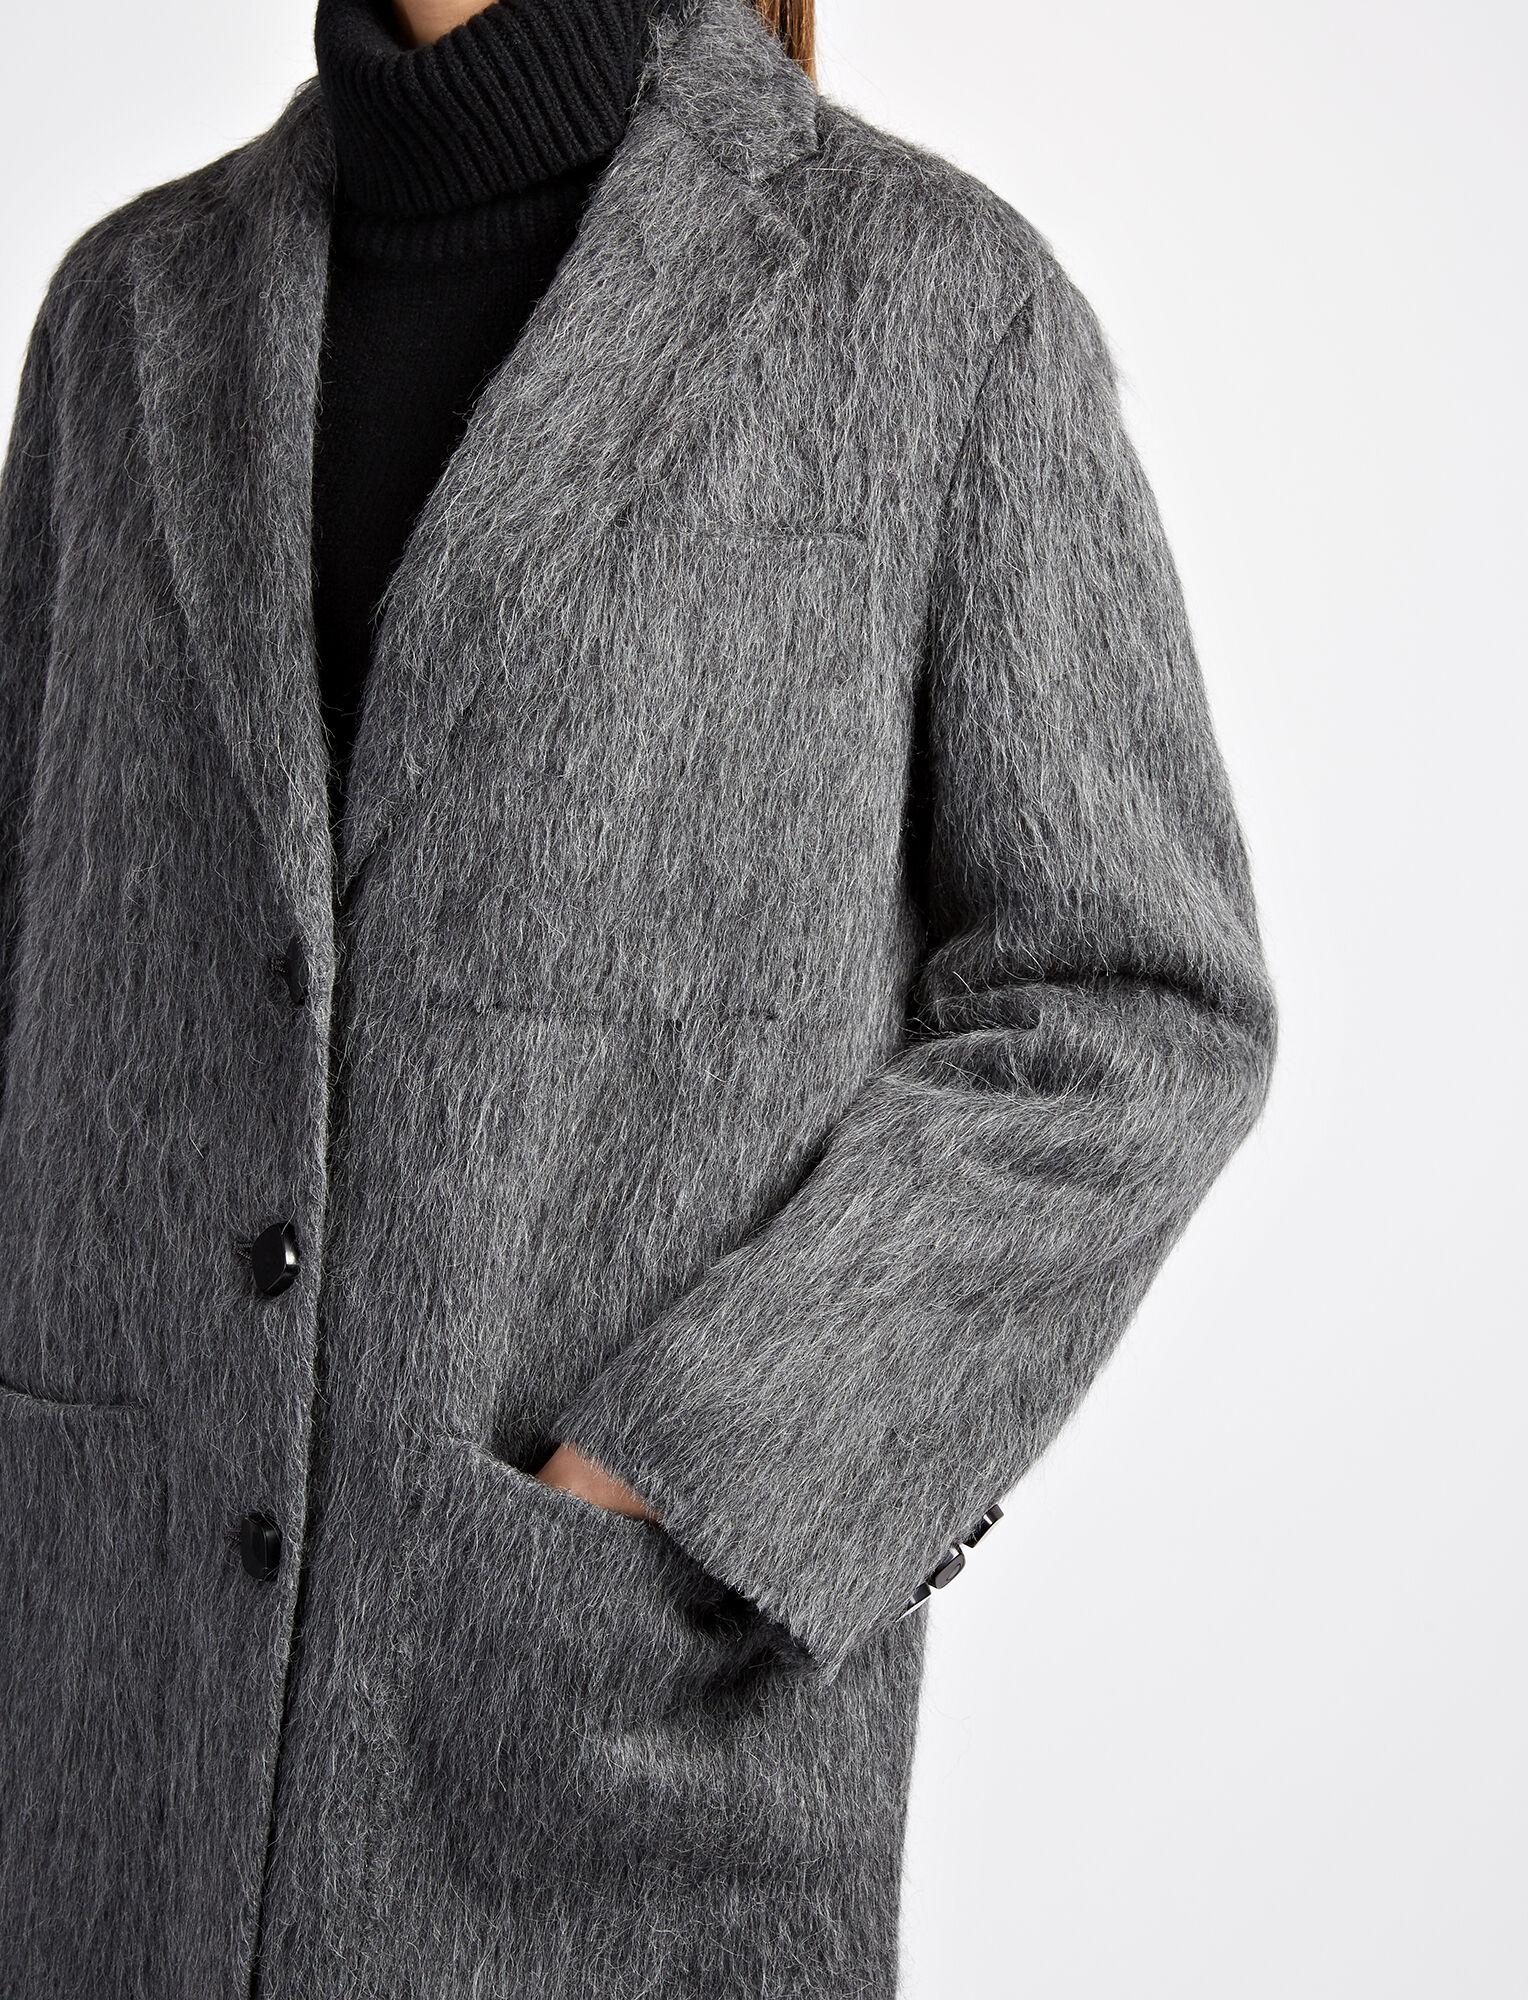 Joseph, Double Alpaca Jimo Coat, in GRAPHITE